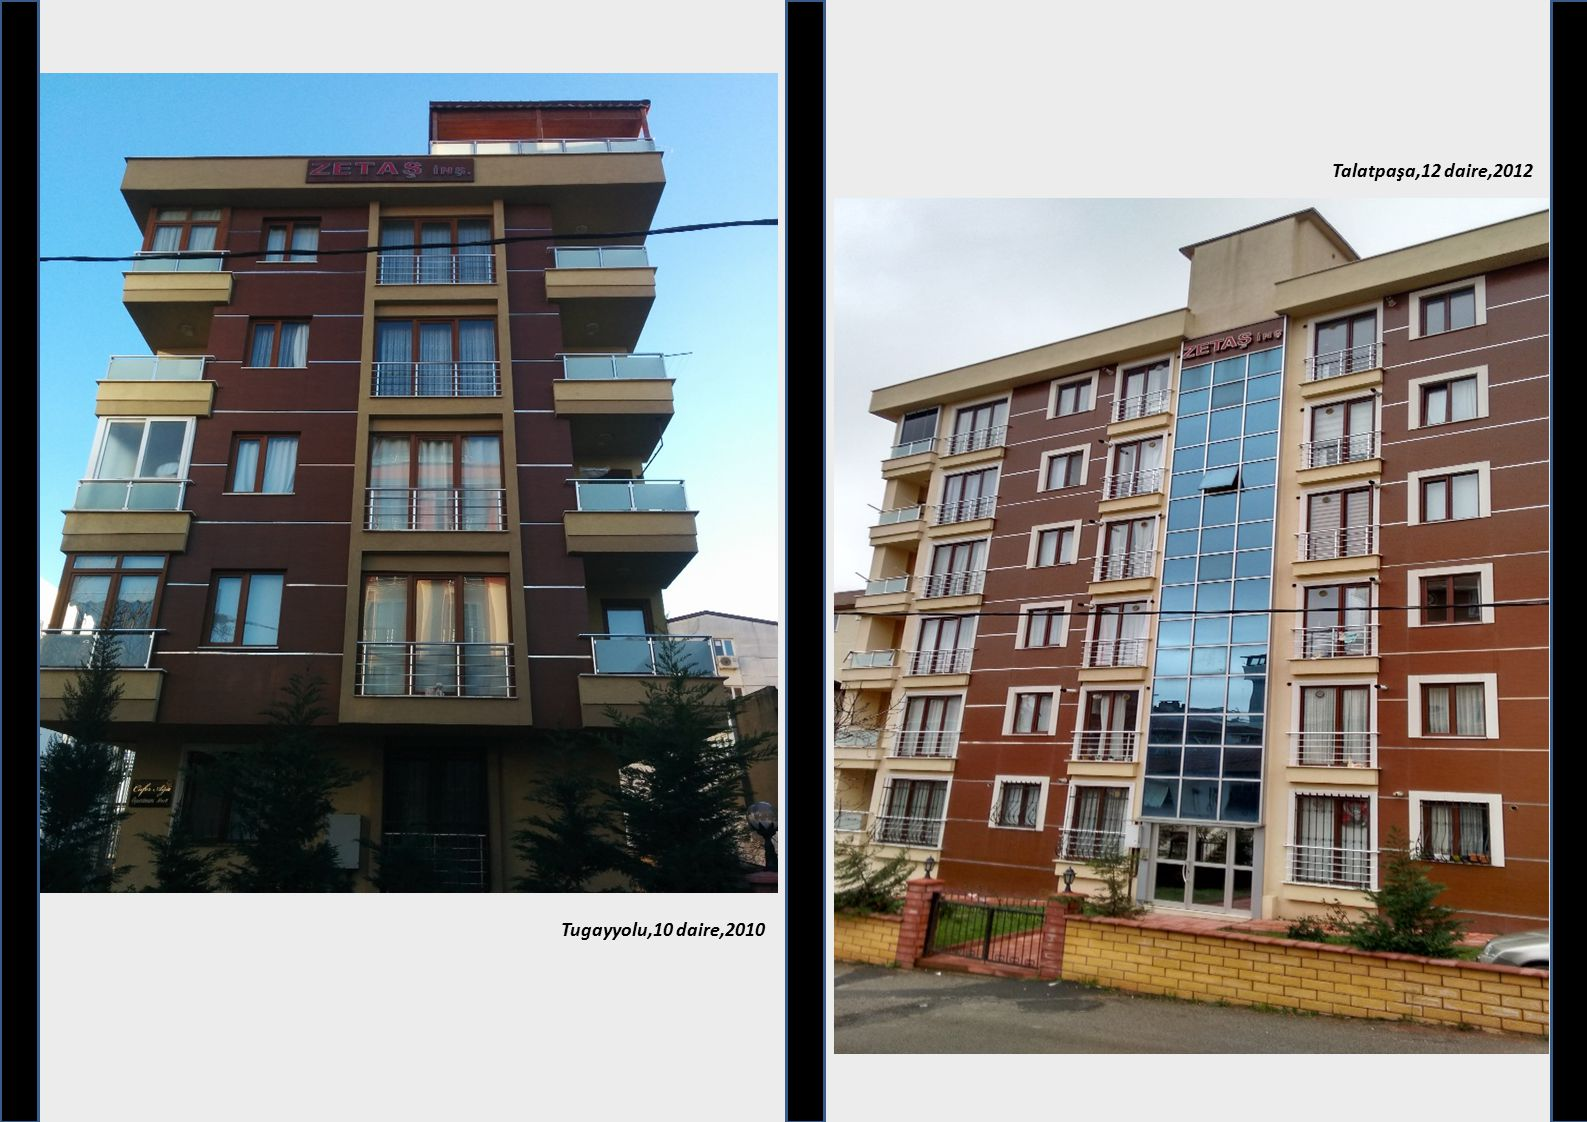 Tugayyolu,10 daire,2010 Talatpaşa,12 daire,2012